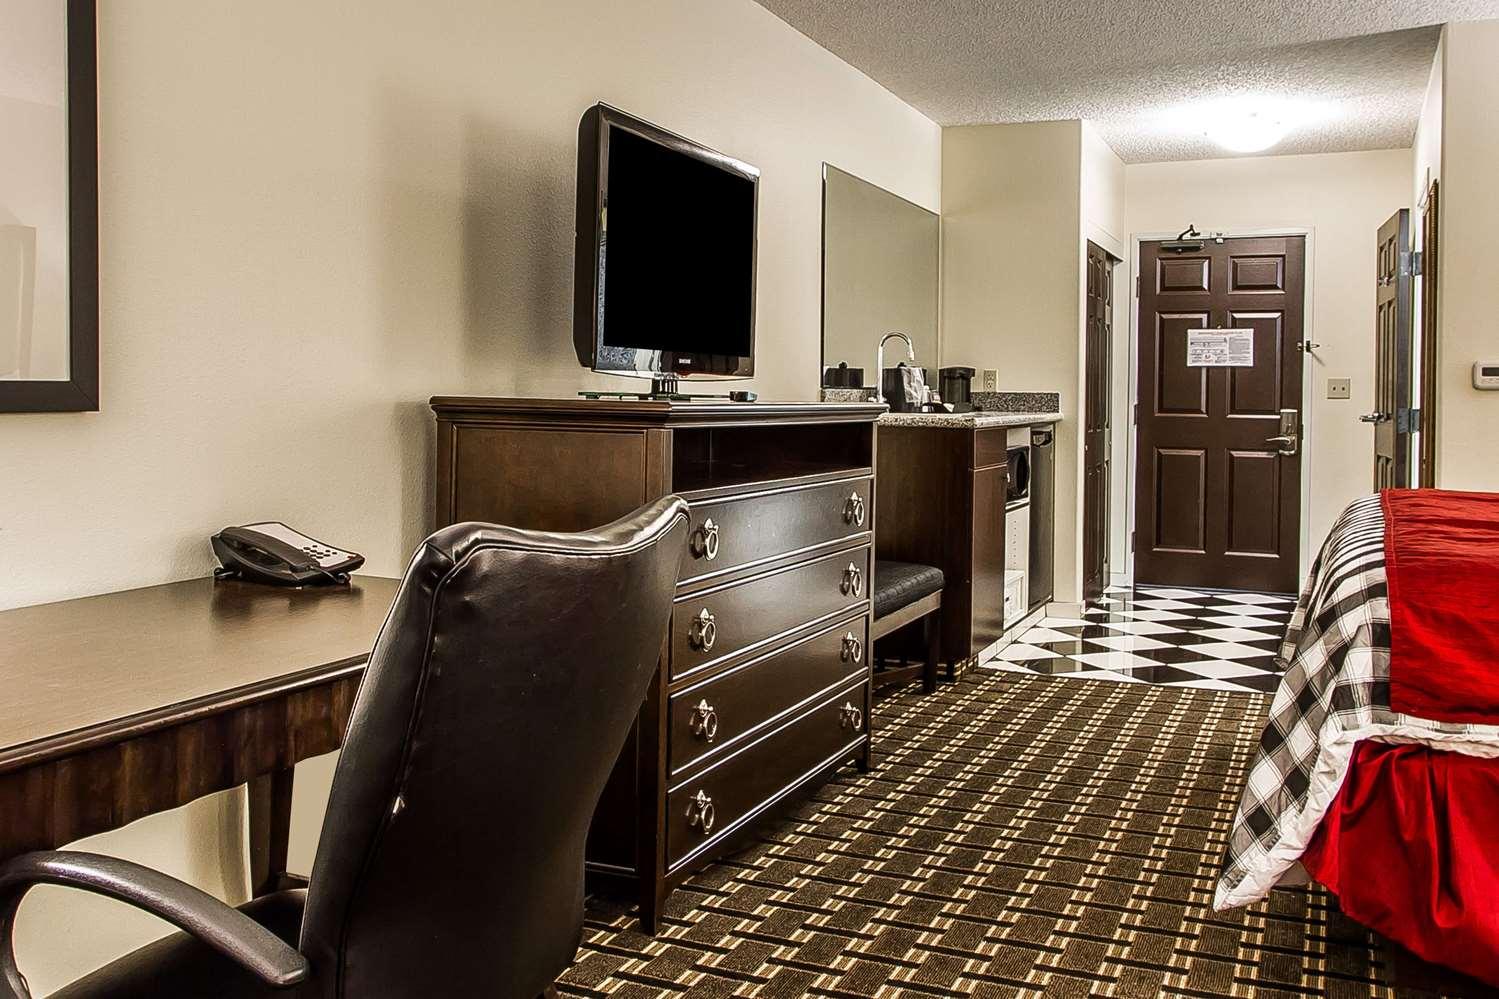 Suite - Evangeline Downs Hotel Opelousas